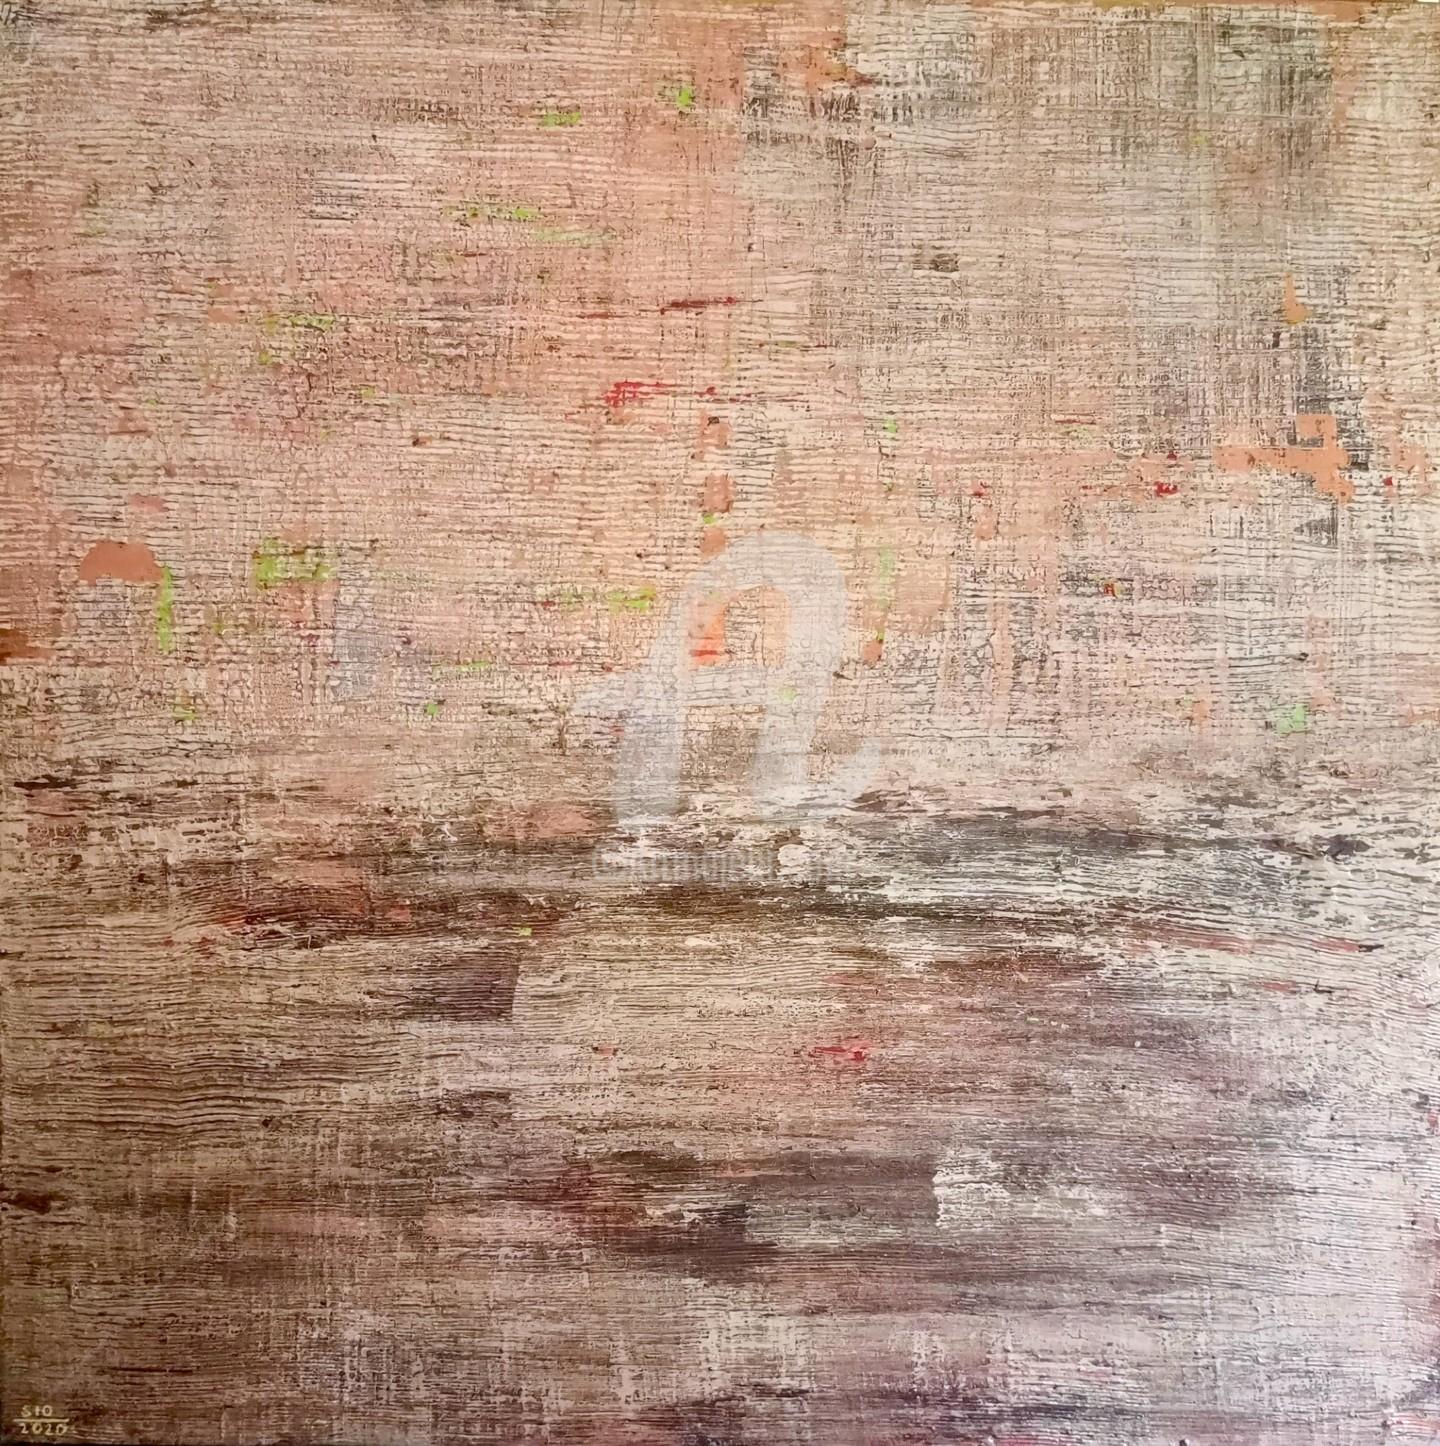 Sio Montera - The Less I Needed the Better I Felt